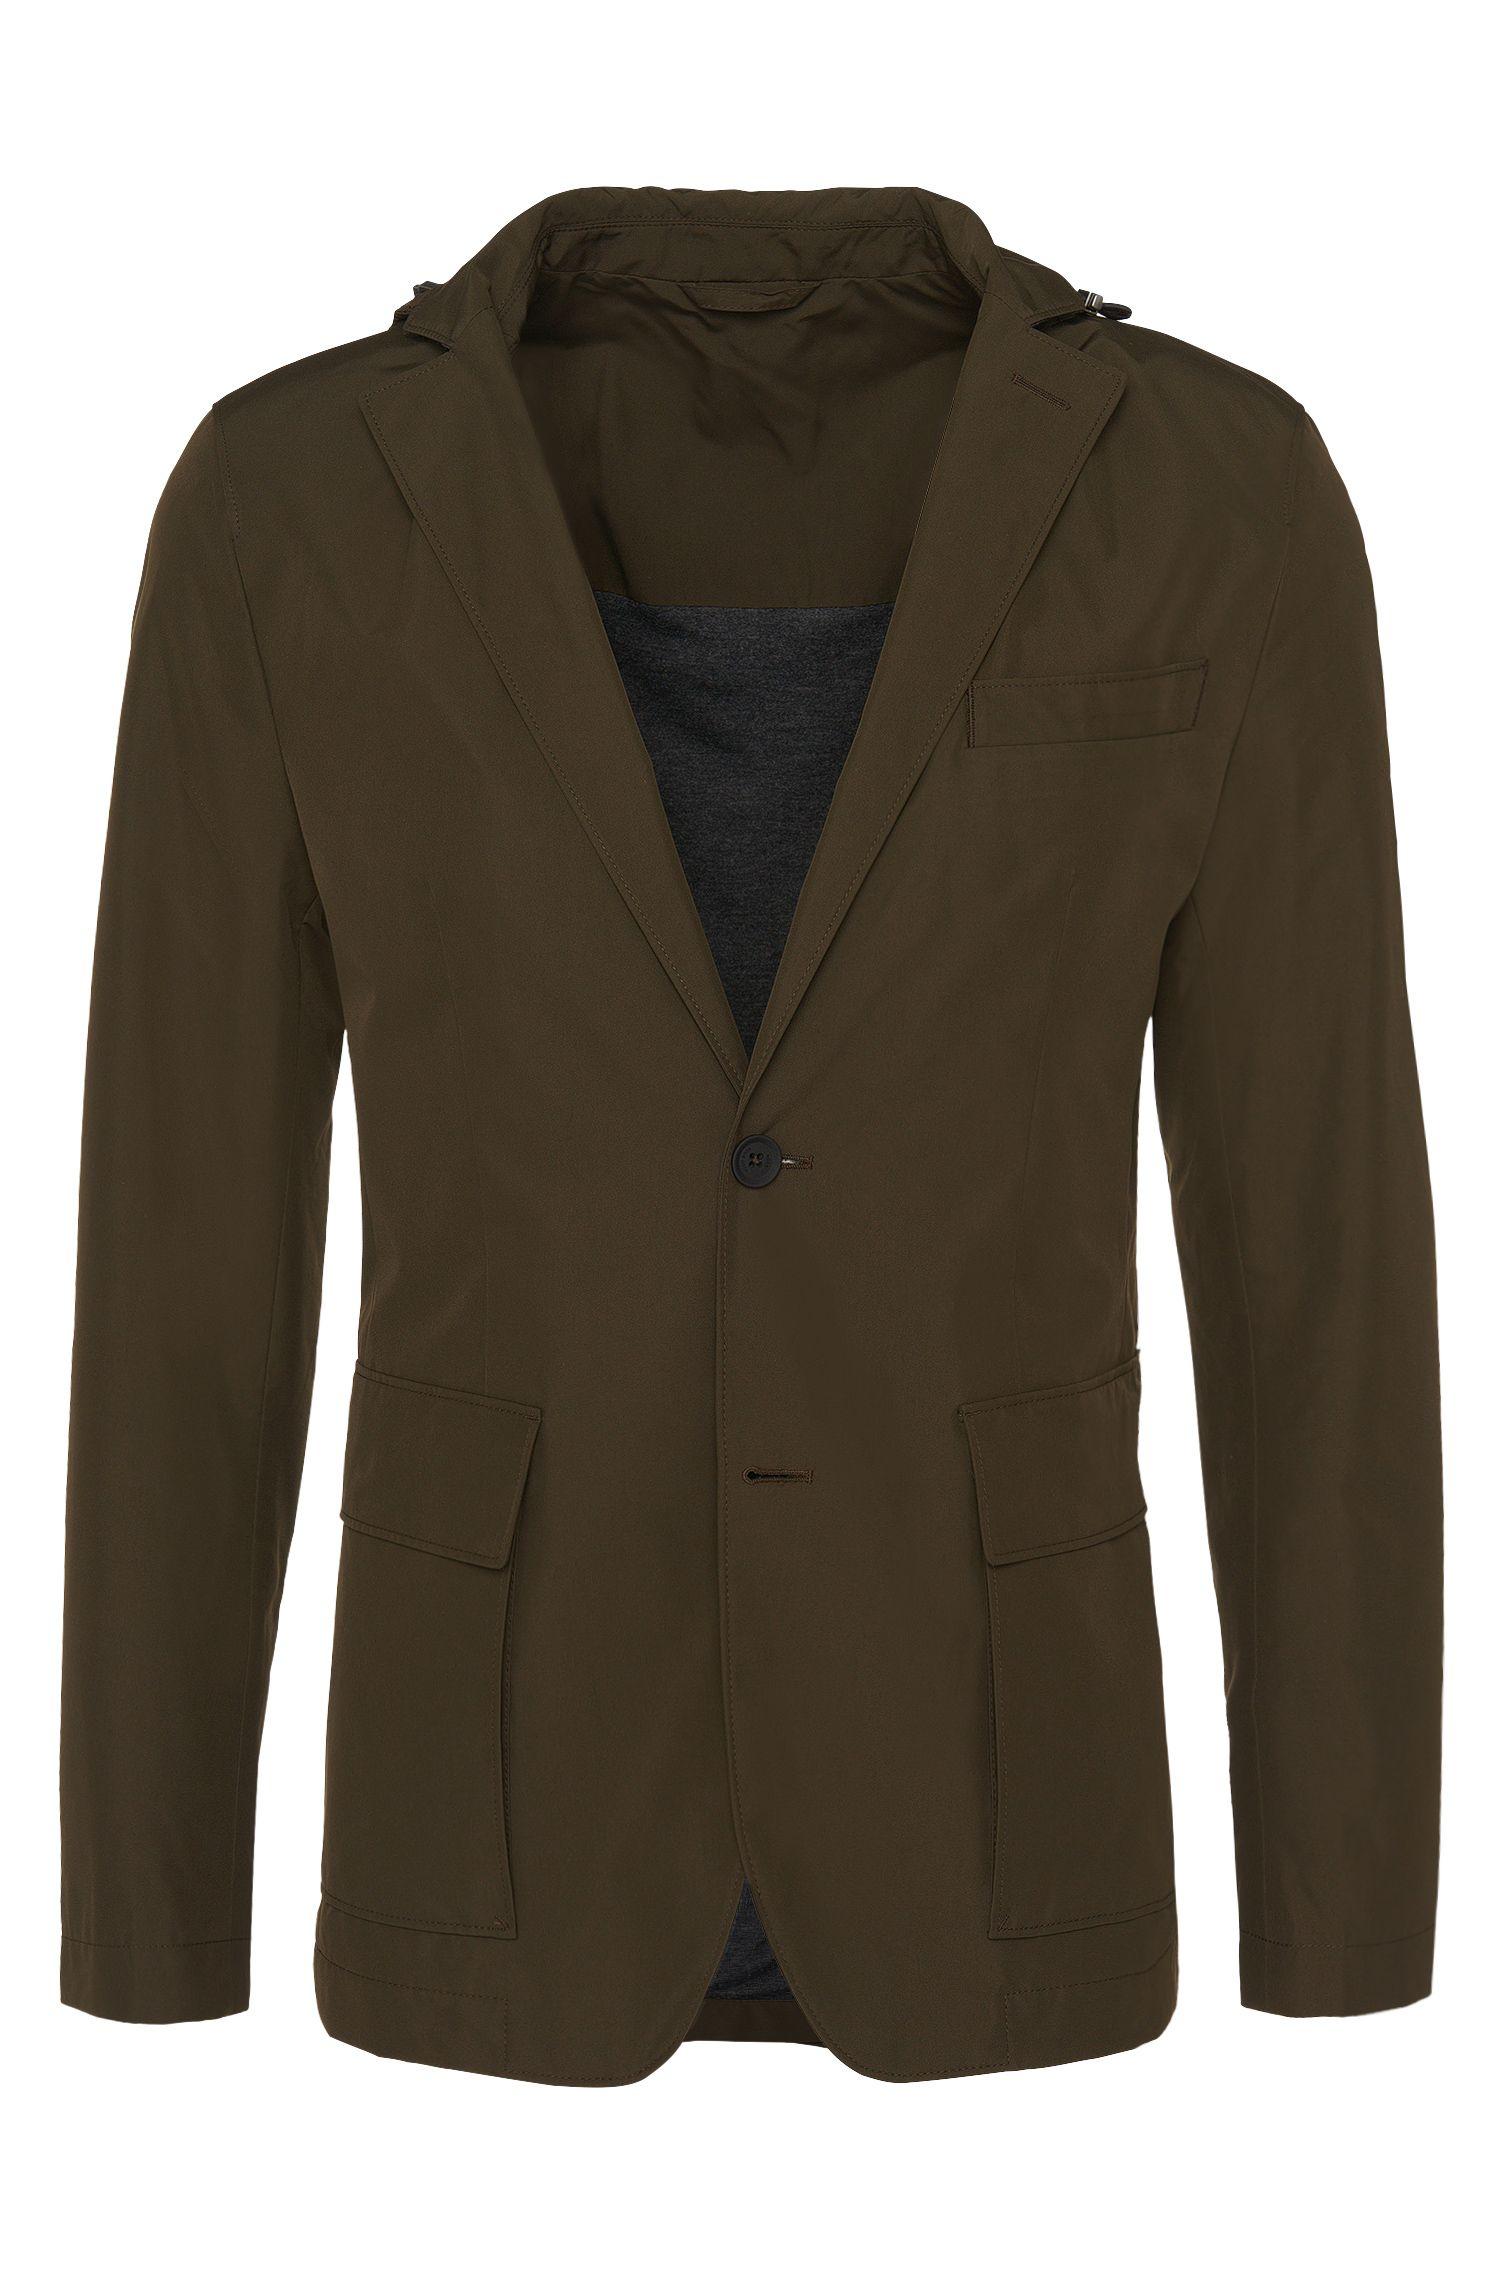 'Nielson' | Slim Fit, Water-Repellent Packable Sport Coat